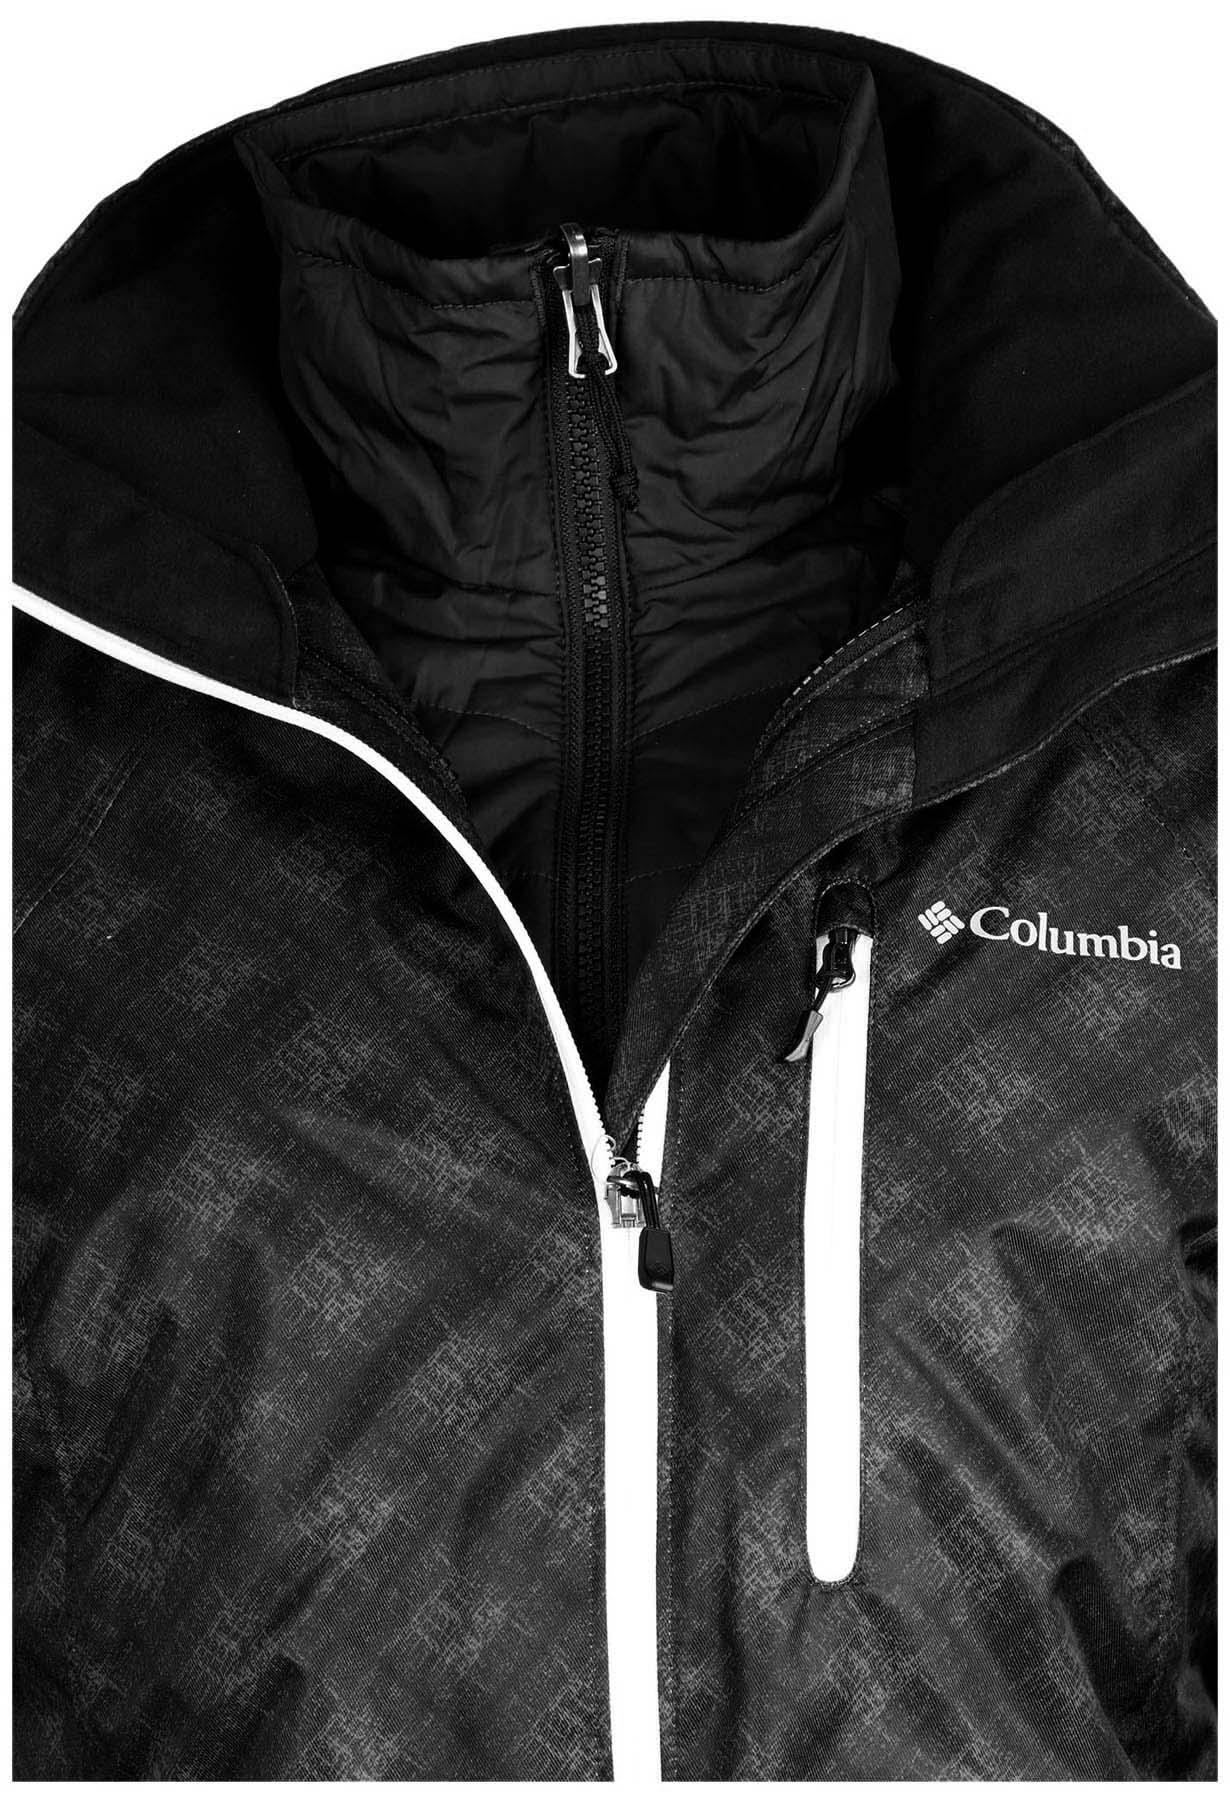 Columbia Women's Nordic Point II Interchange Jacket | eBay